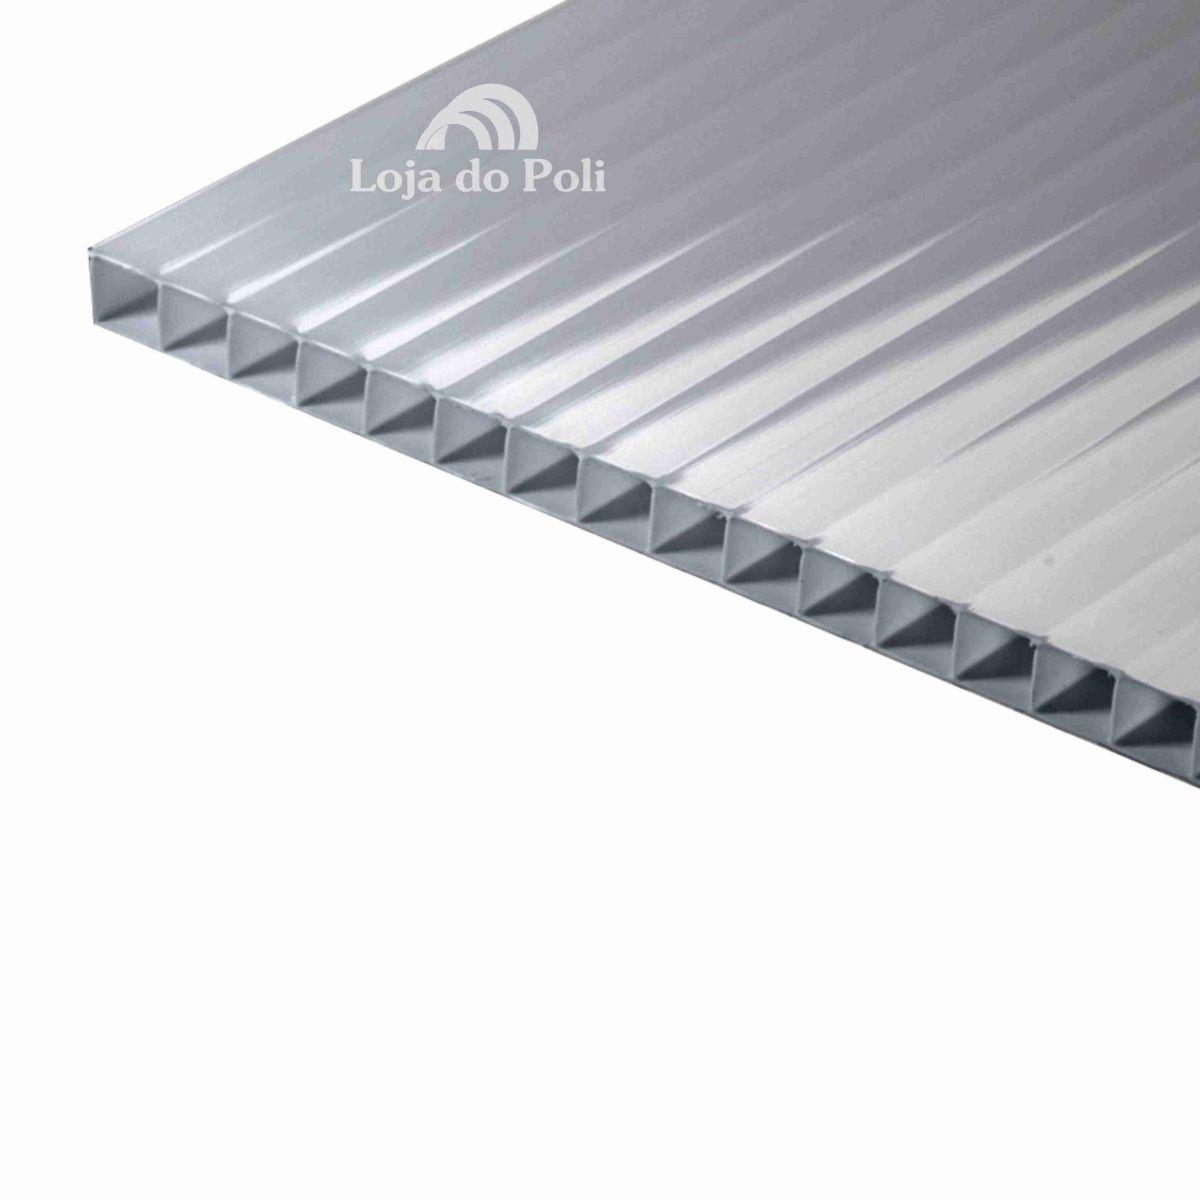 Chapa Policarbonato Alveolar Prata Solar Reflective 6mm 1,0x6,0m